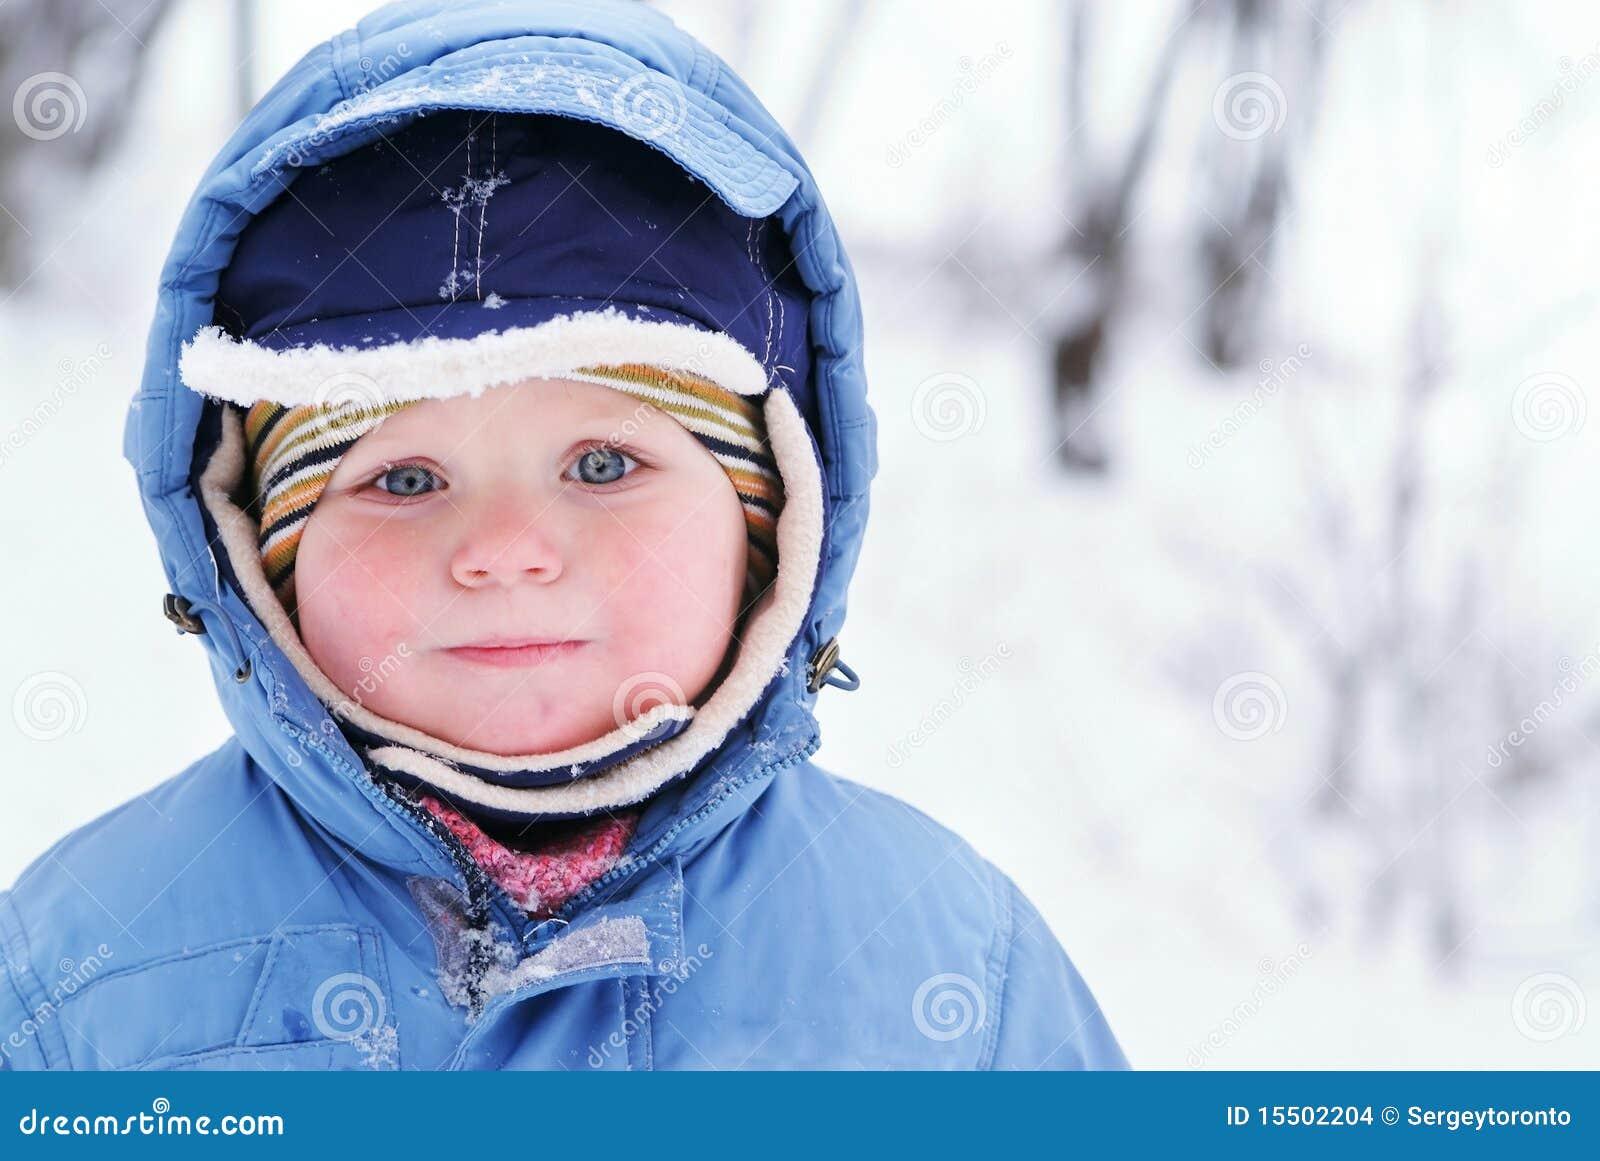 97bbc2886df7 Cute Boy Snowsuit Stock Images - Download 568 Royalty Free Photos